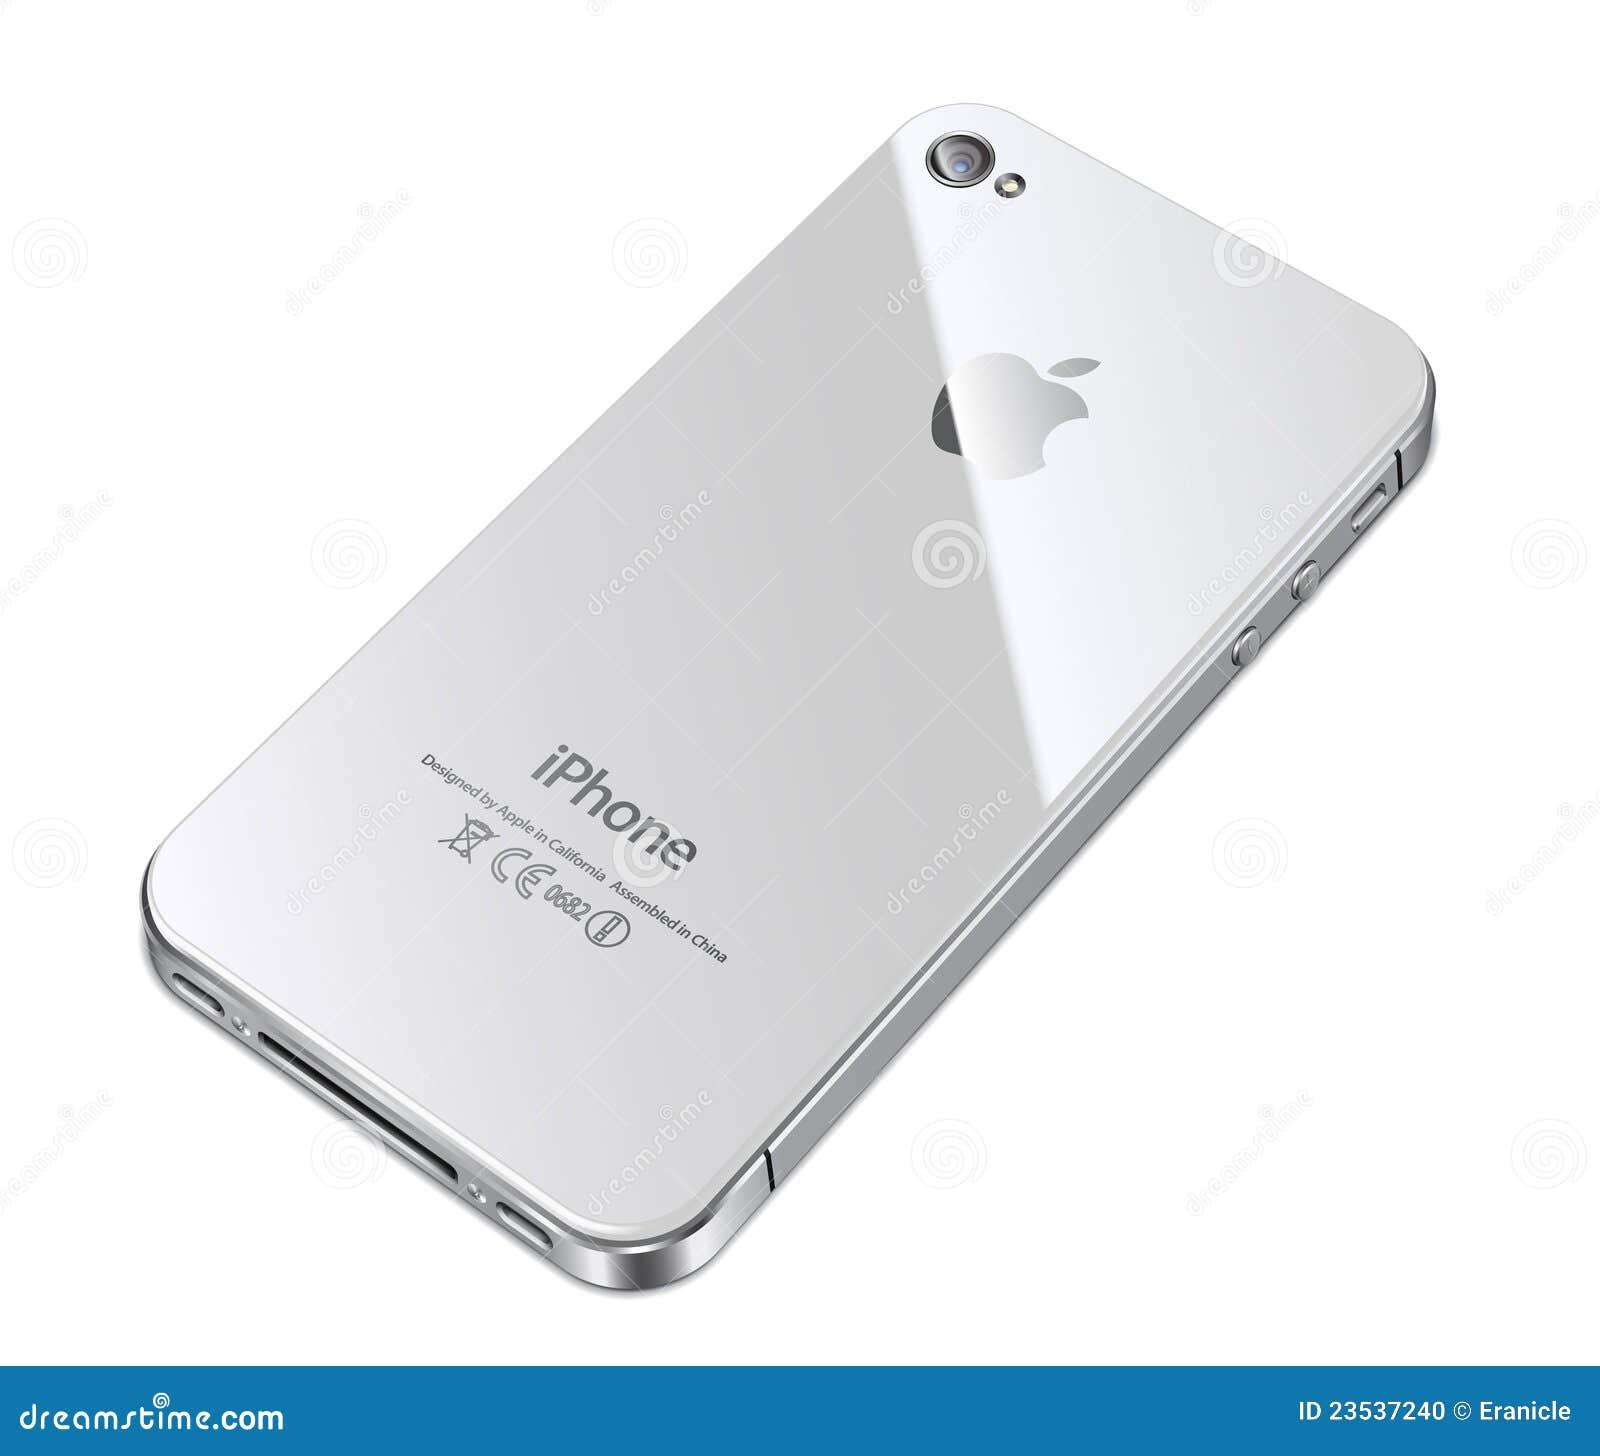 7c7da114f2f Parte Posterior Del Blanco Del Iphone 4S De Apple Imagen editorial ...